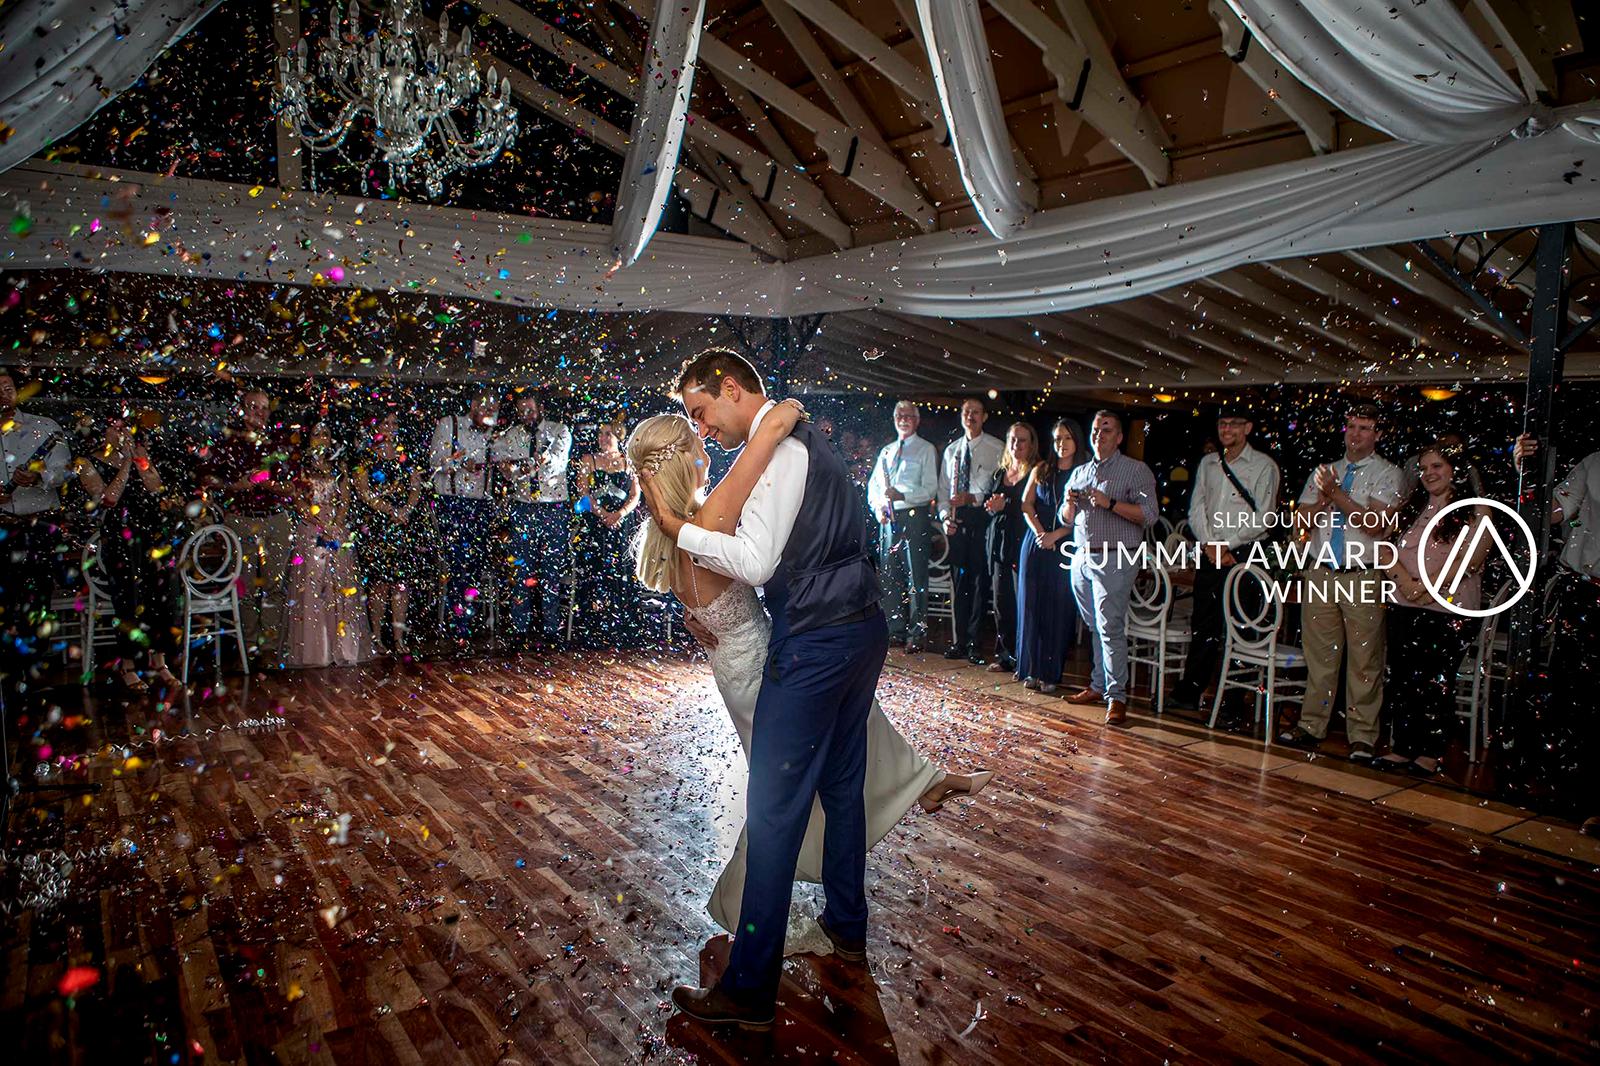 Darrell Fraser SLRLounge Summit Award Winning Wedding Photographer Oakfield Farm Muldersdrift